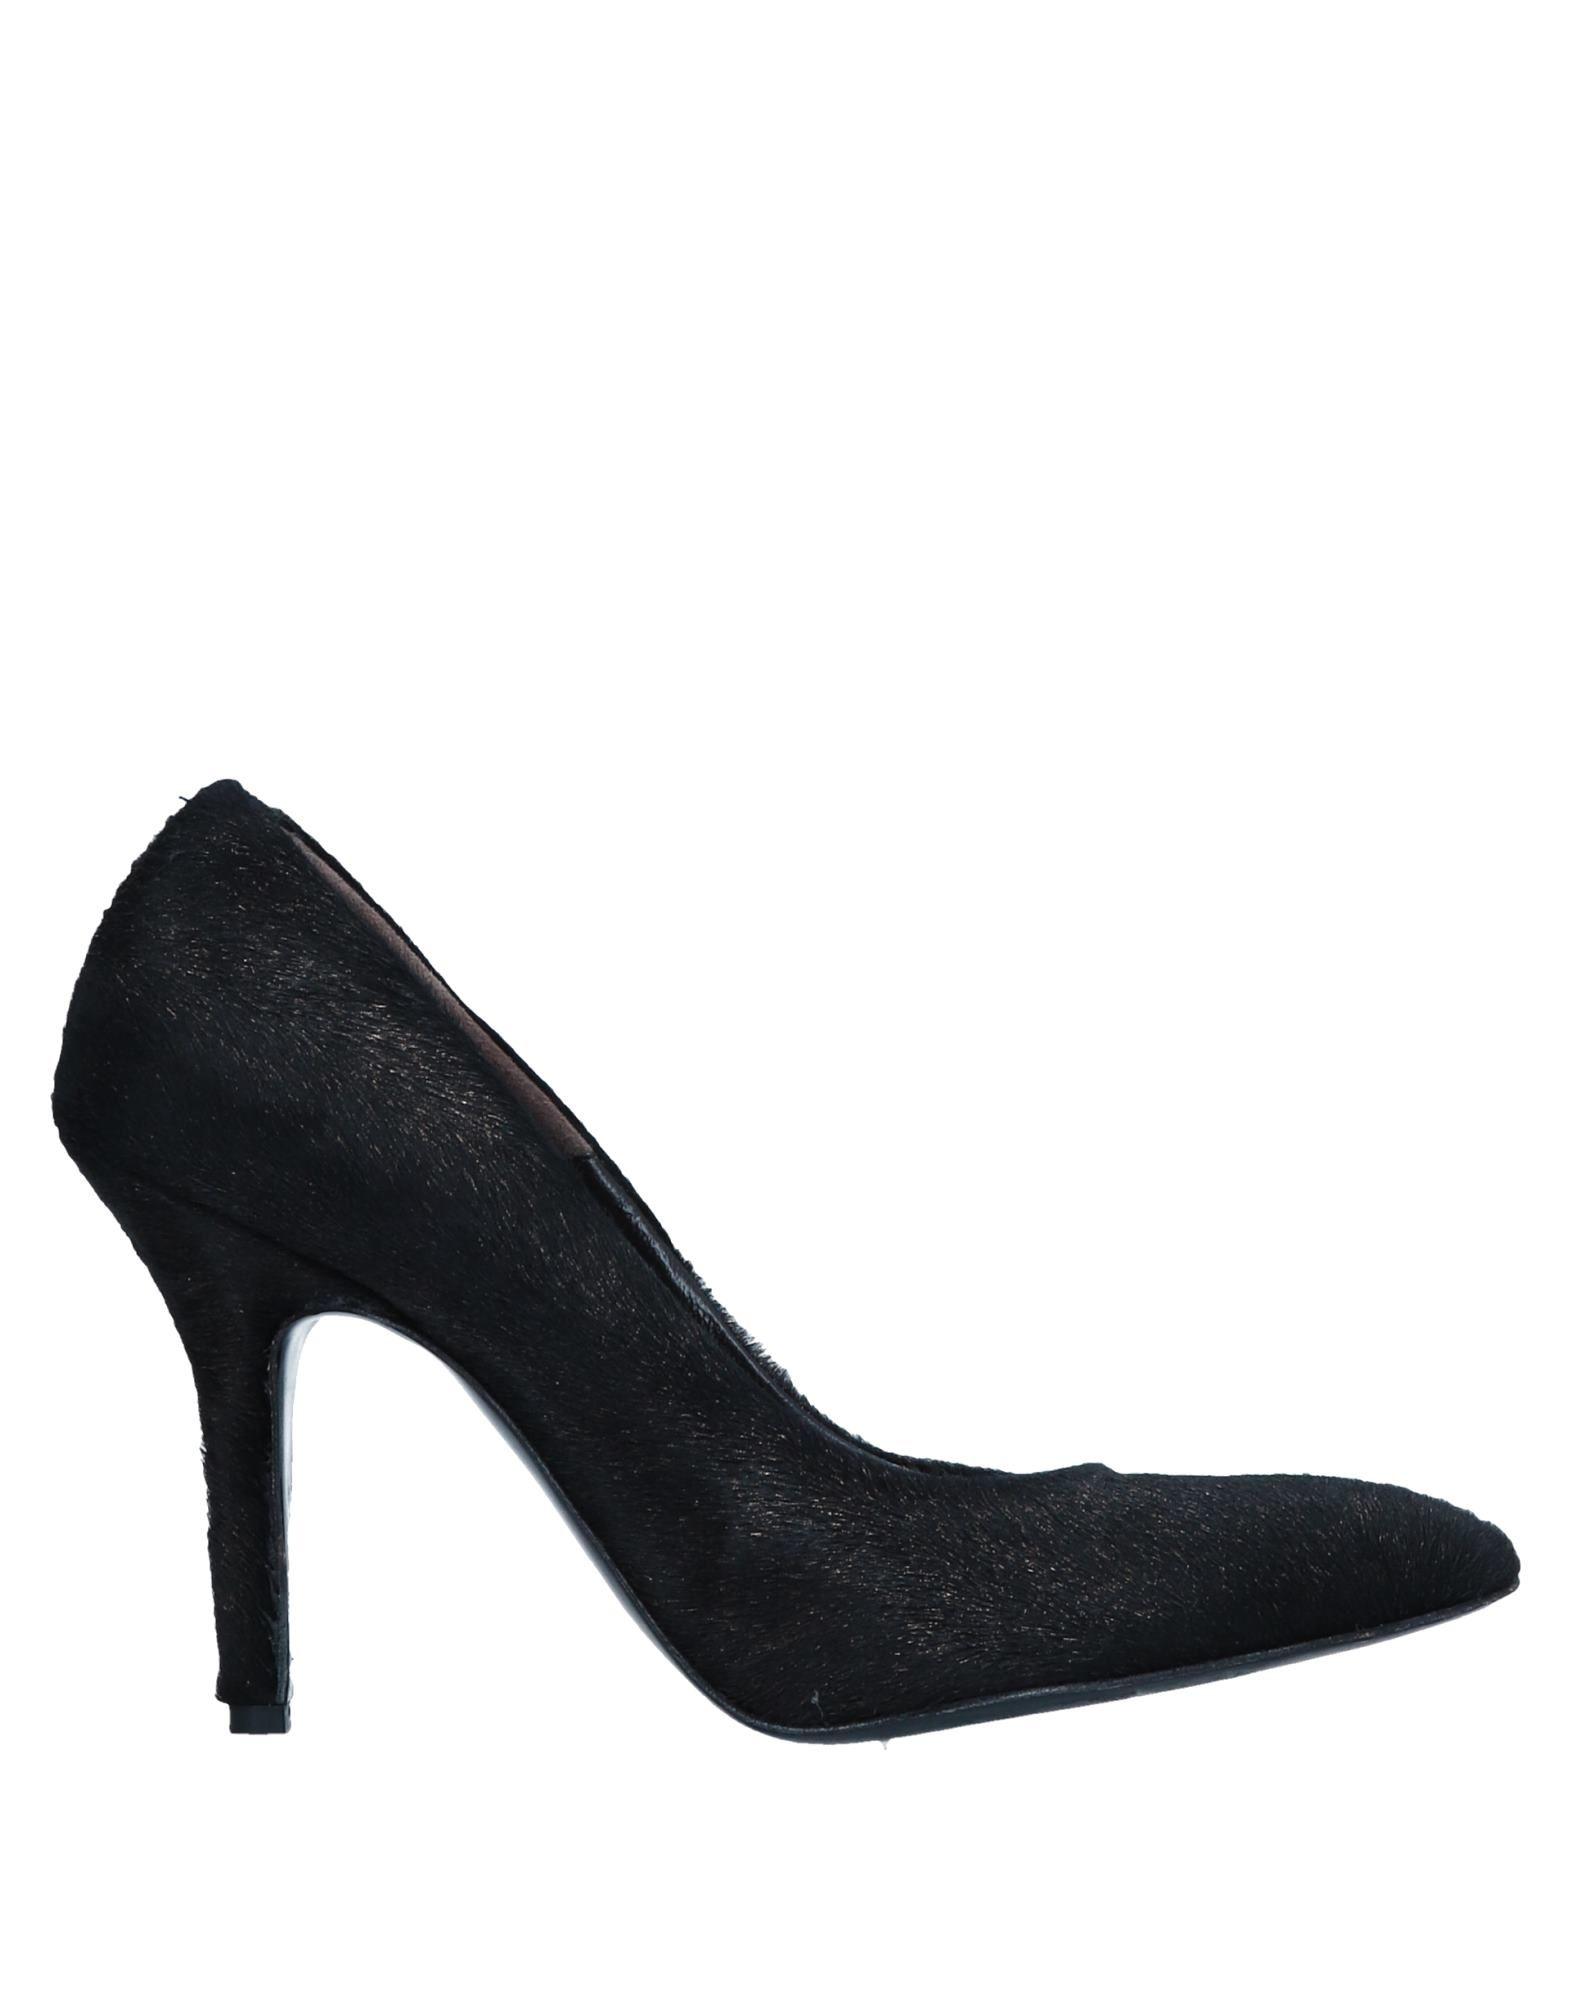 Sandali Town offerte Donna - 11520821HE Nuove offerte Town e scarpe comode c3f677